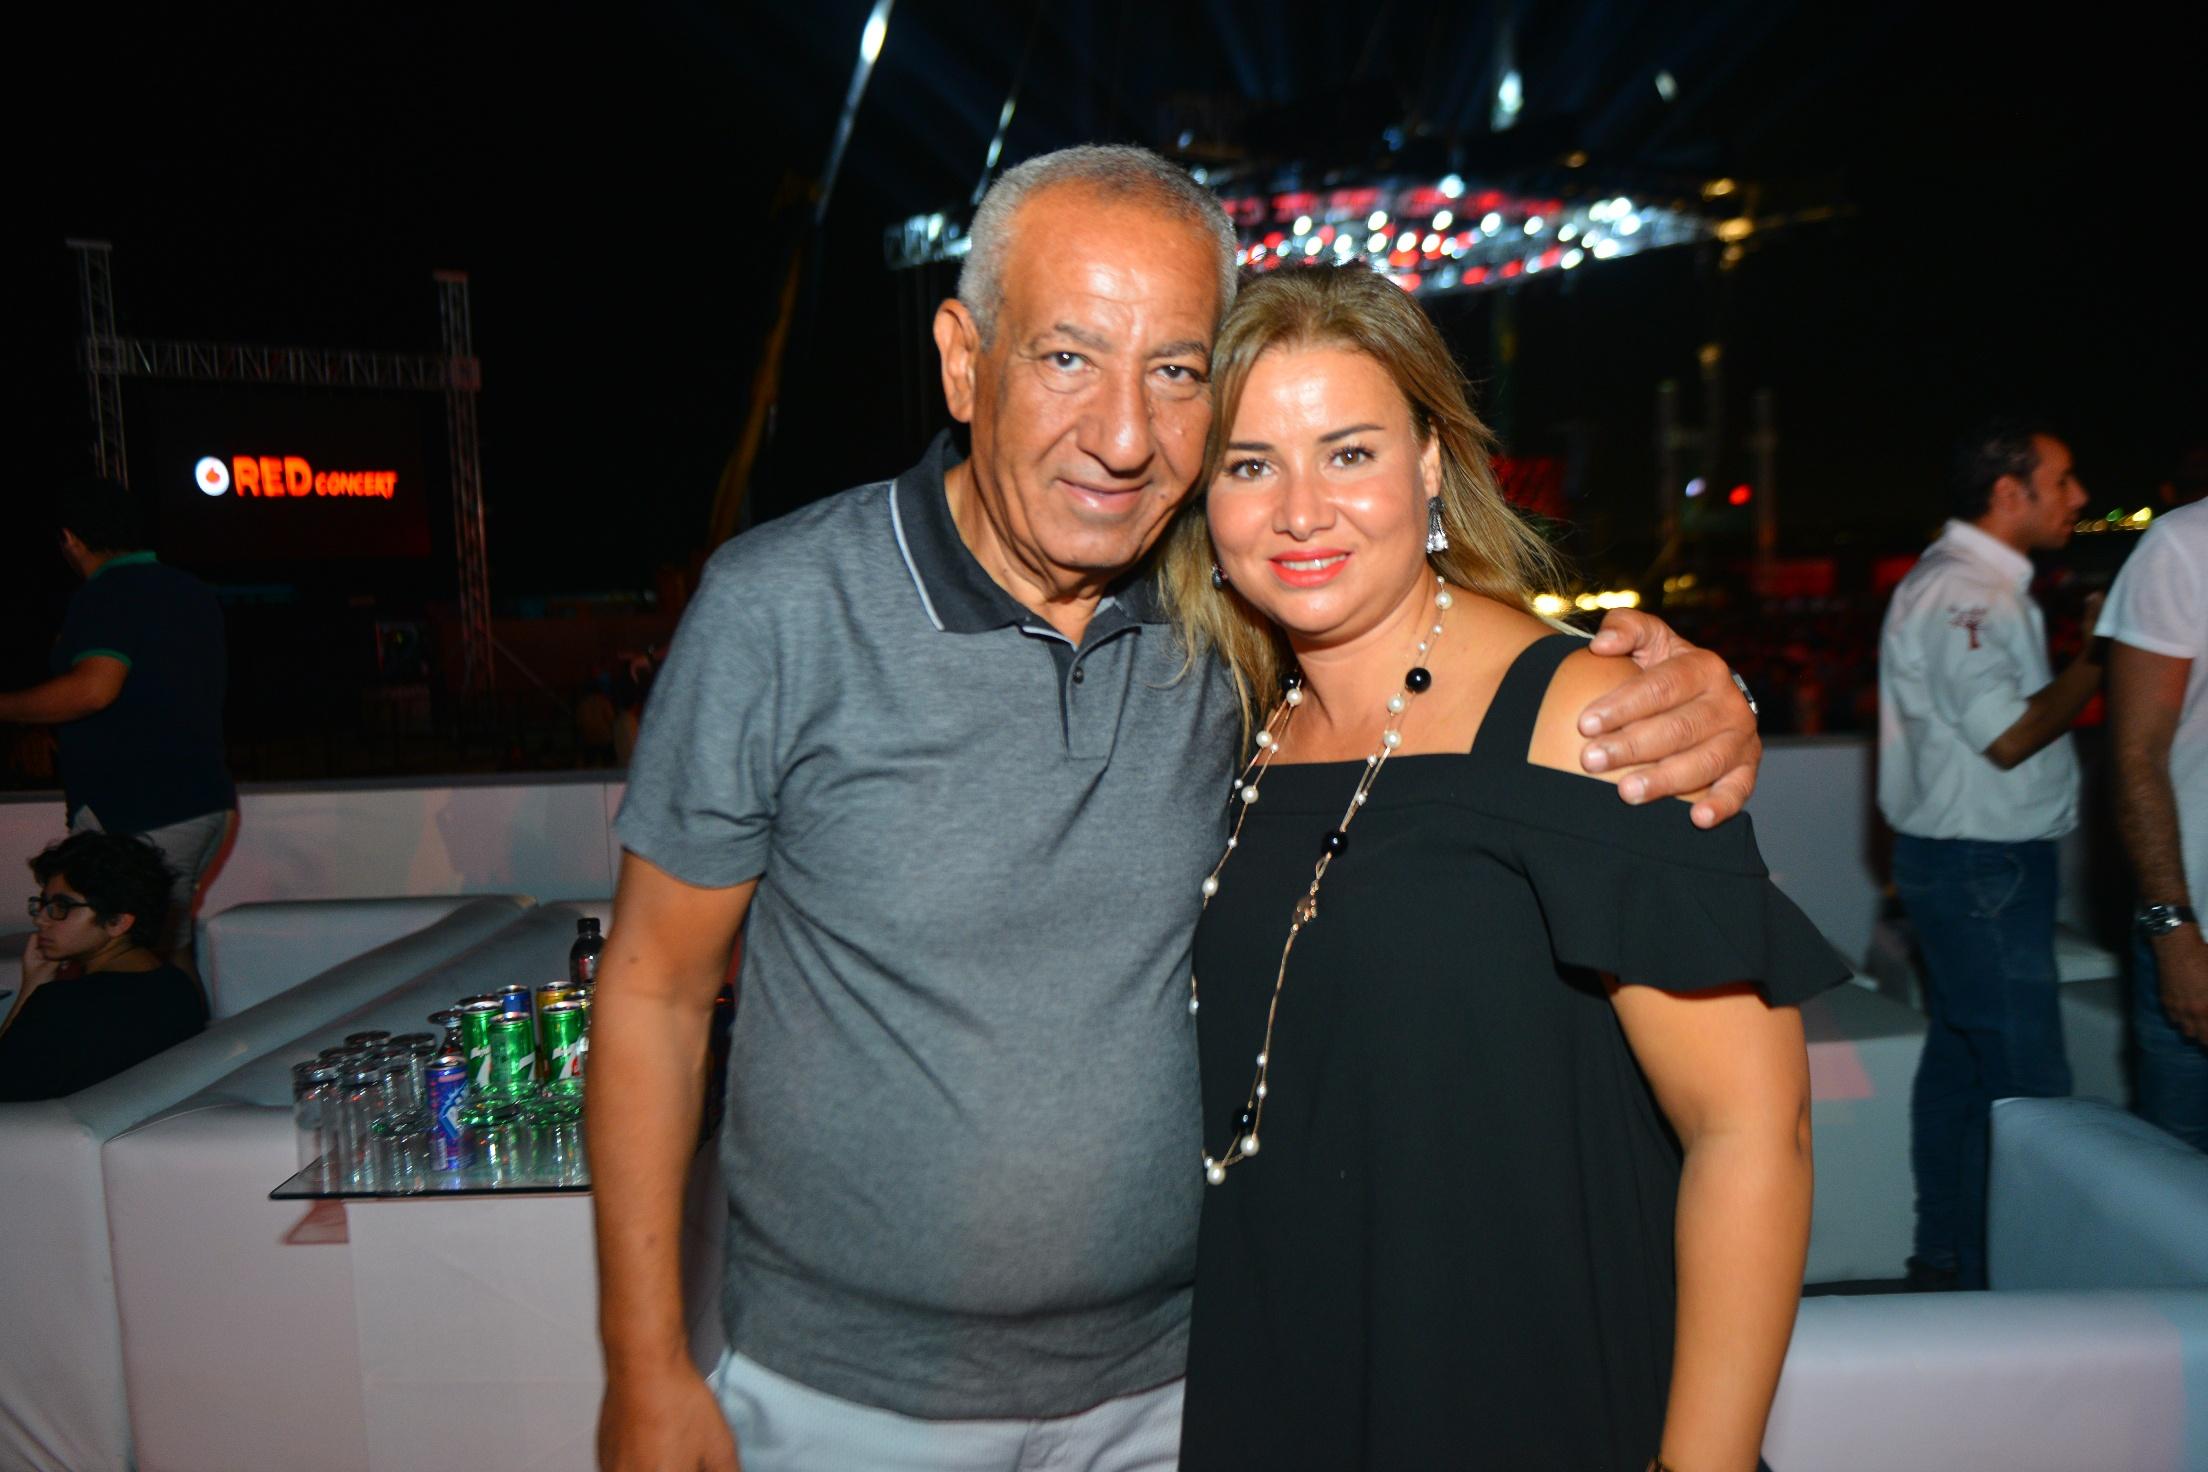 Mr. & Mrs. Kamel Abou Ali